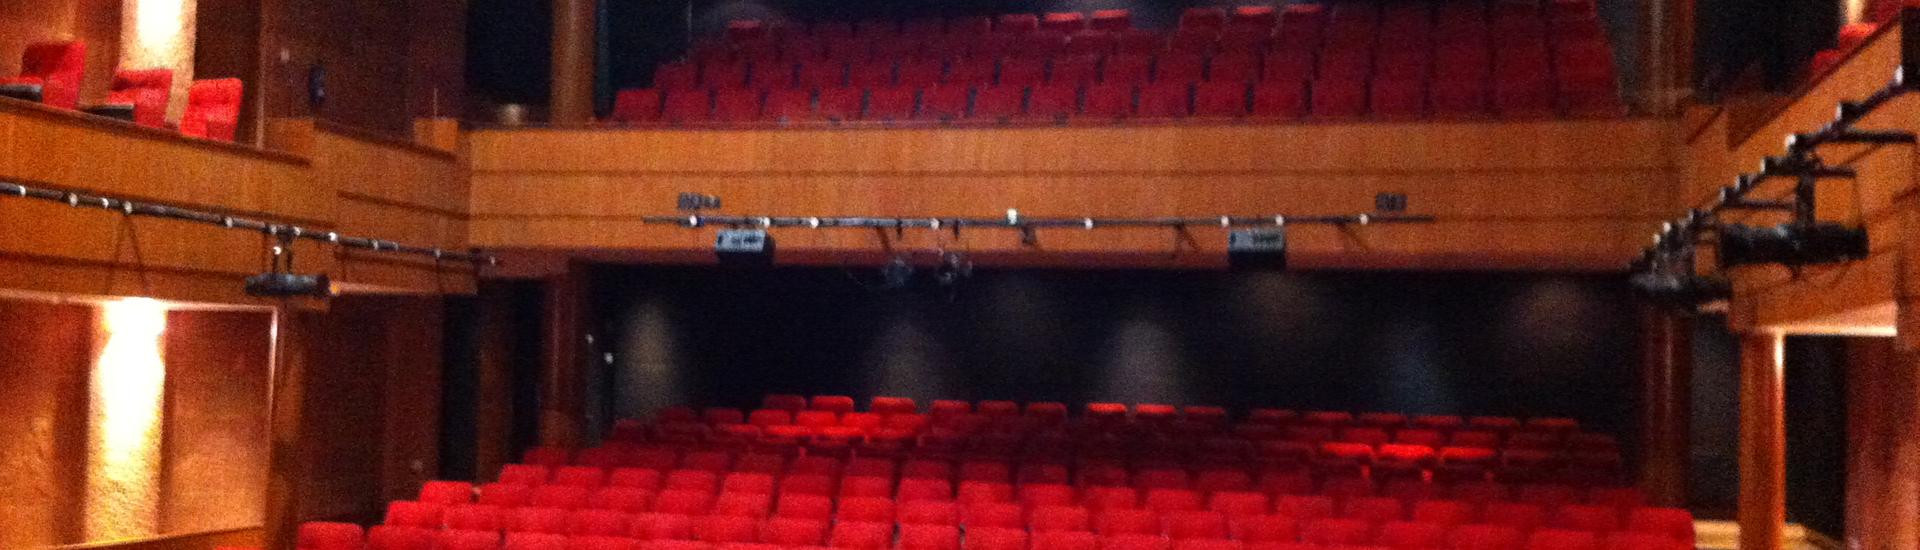 412b8534 KC Arts Centre - Home of Singapore Repertory Theatre | Campaign ...